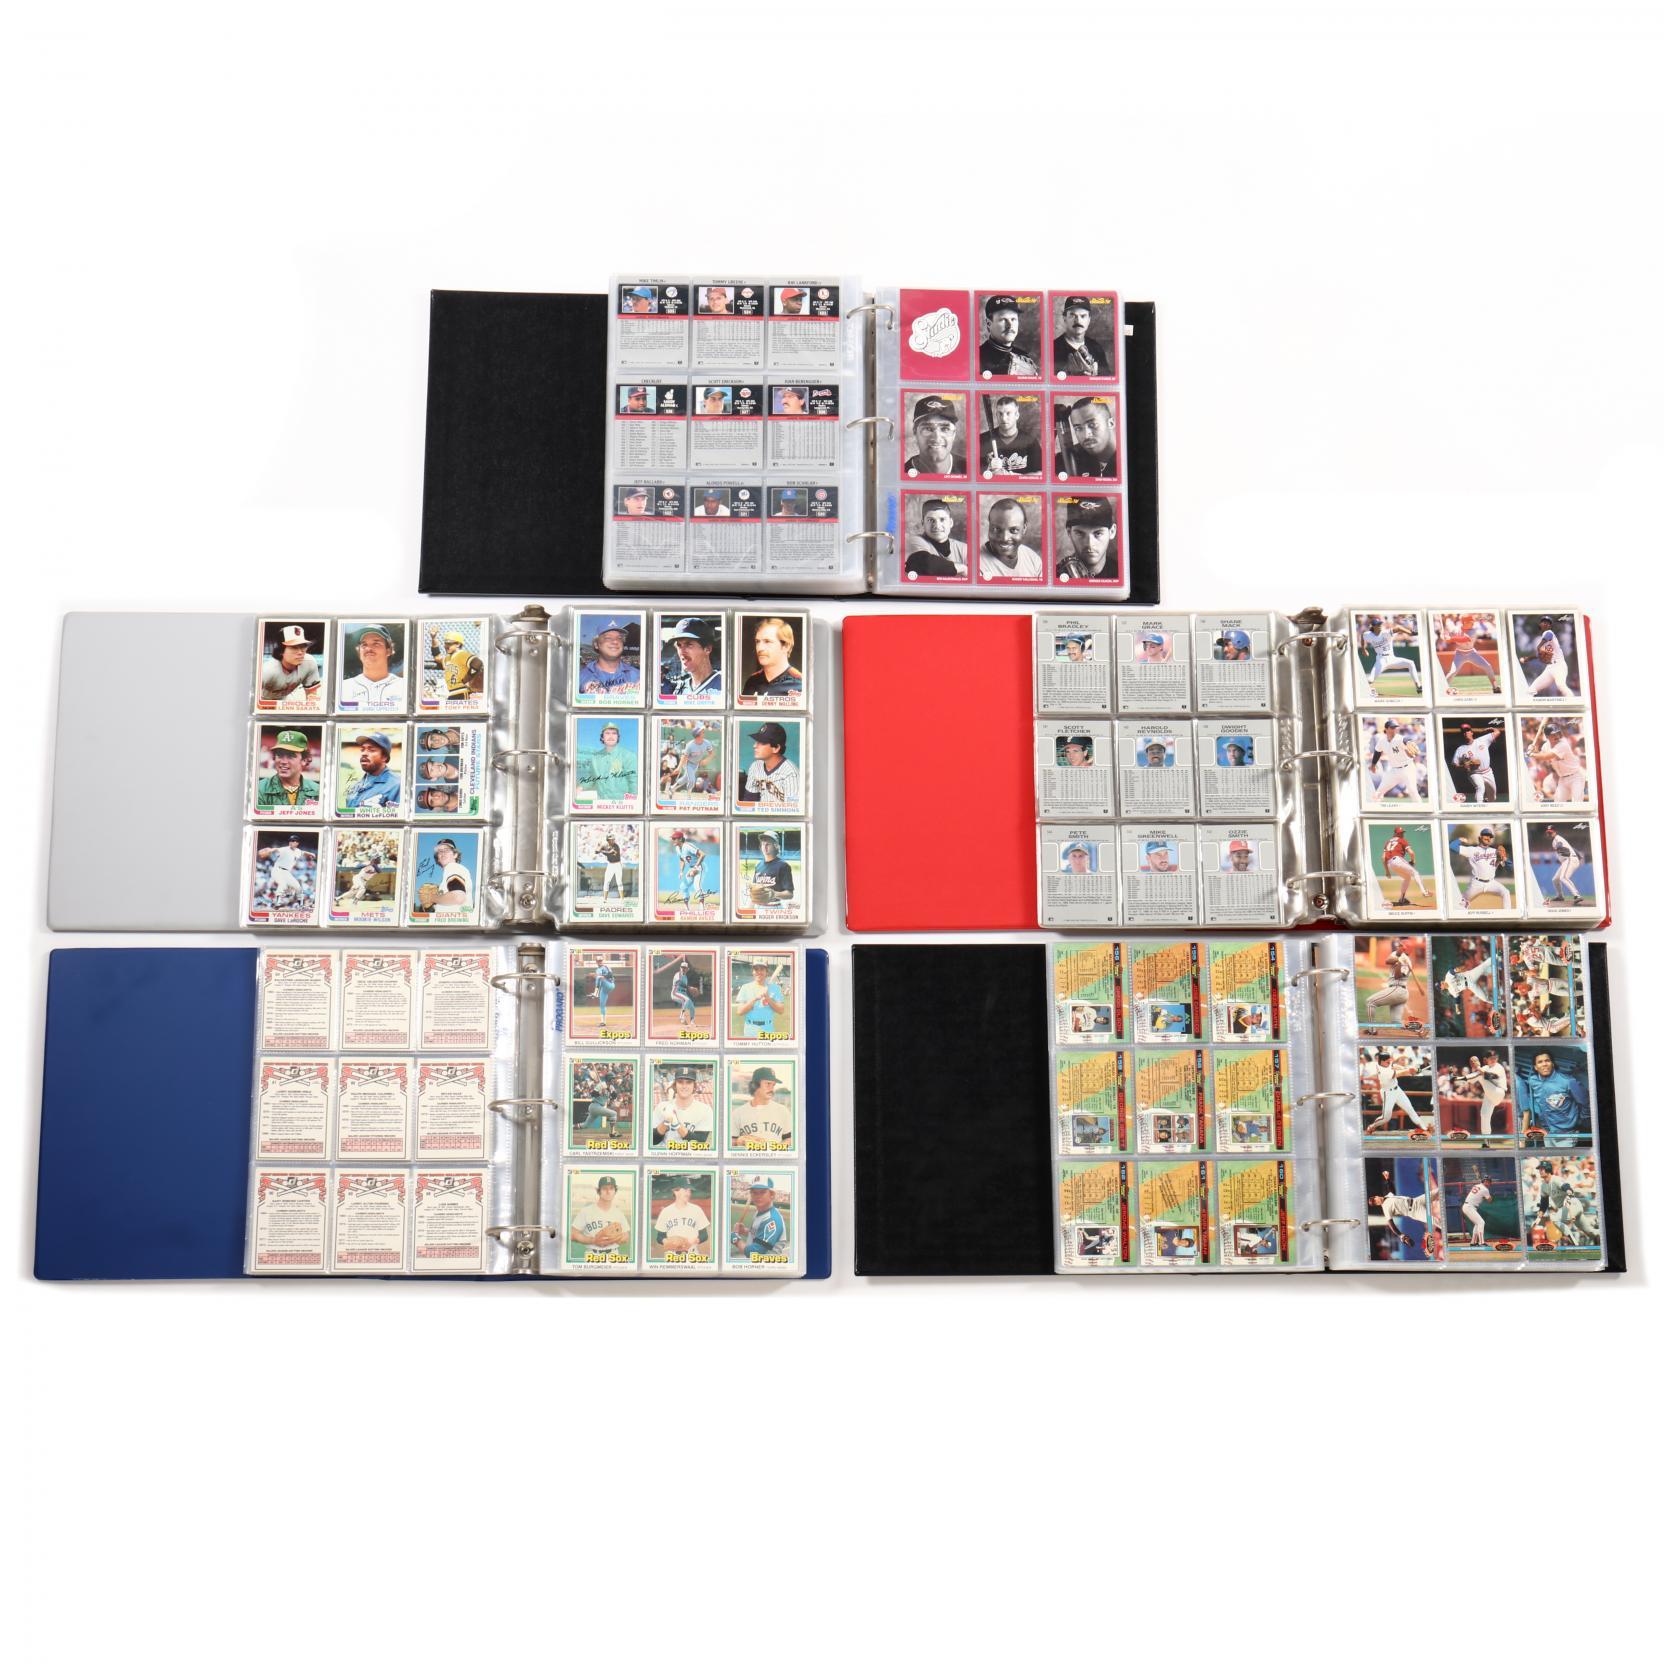 five-baseball-card-albums-1981-82-and-1990-91